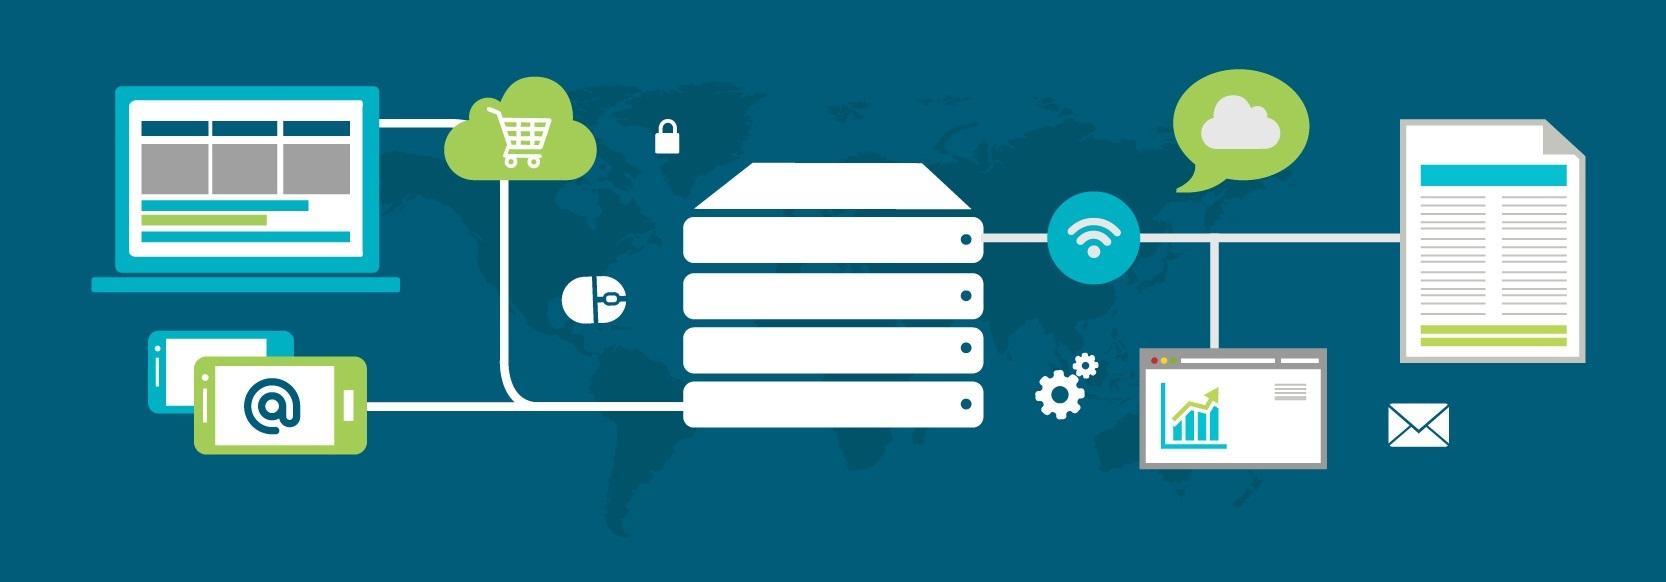 web-hosting-banner-1666x582